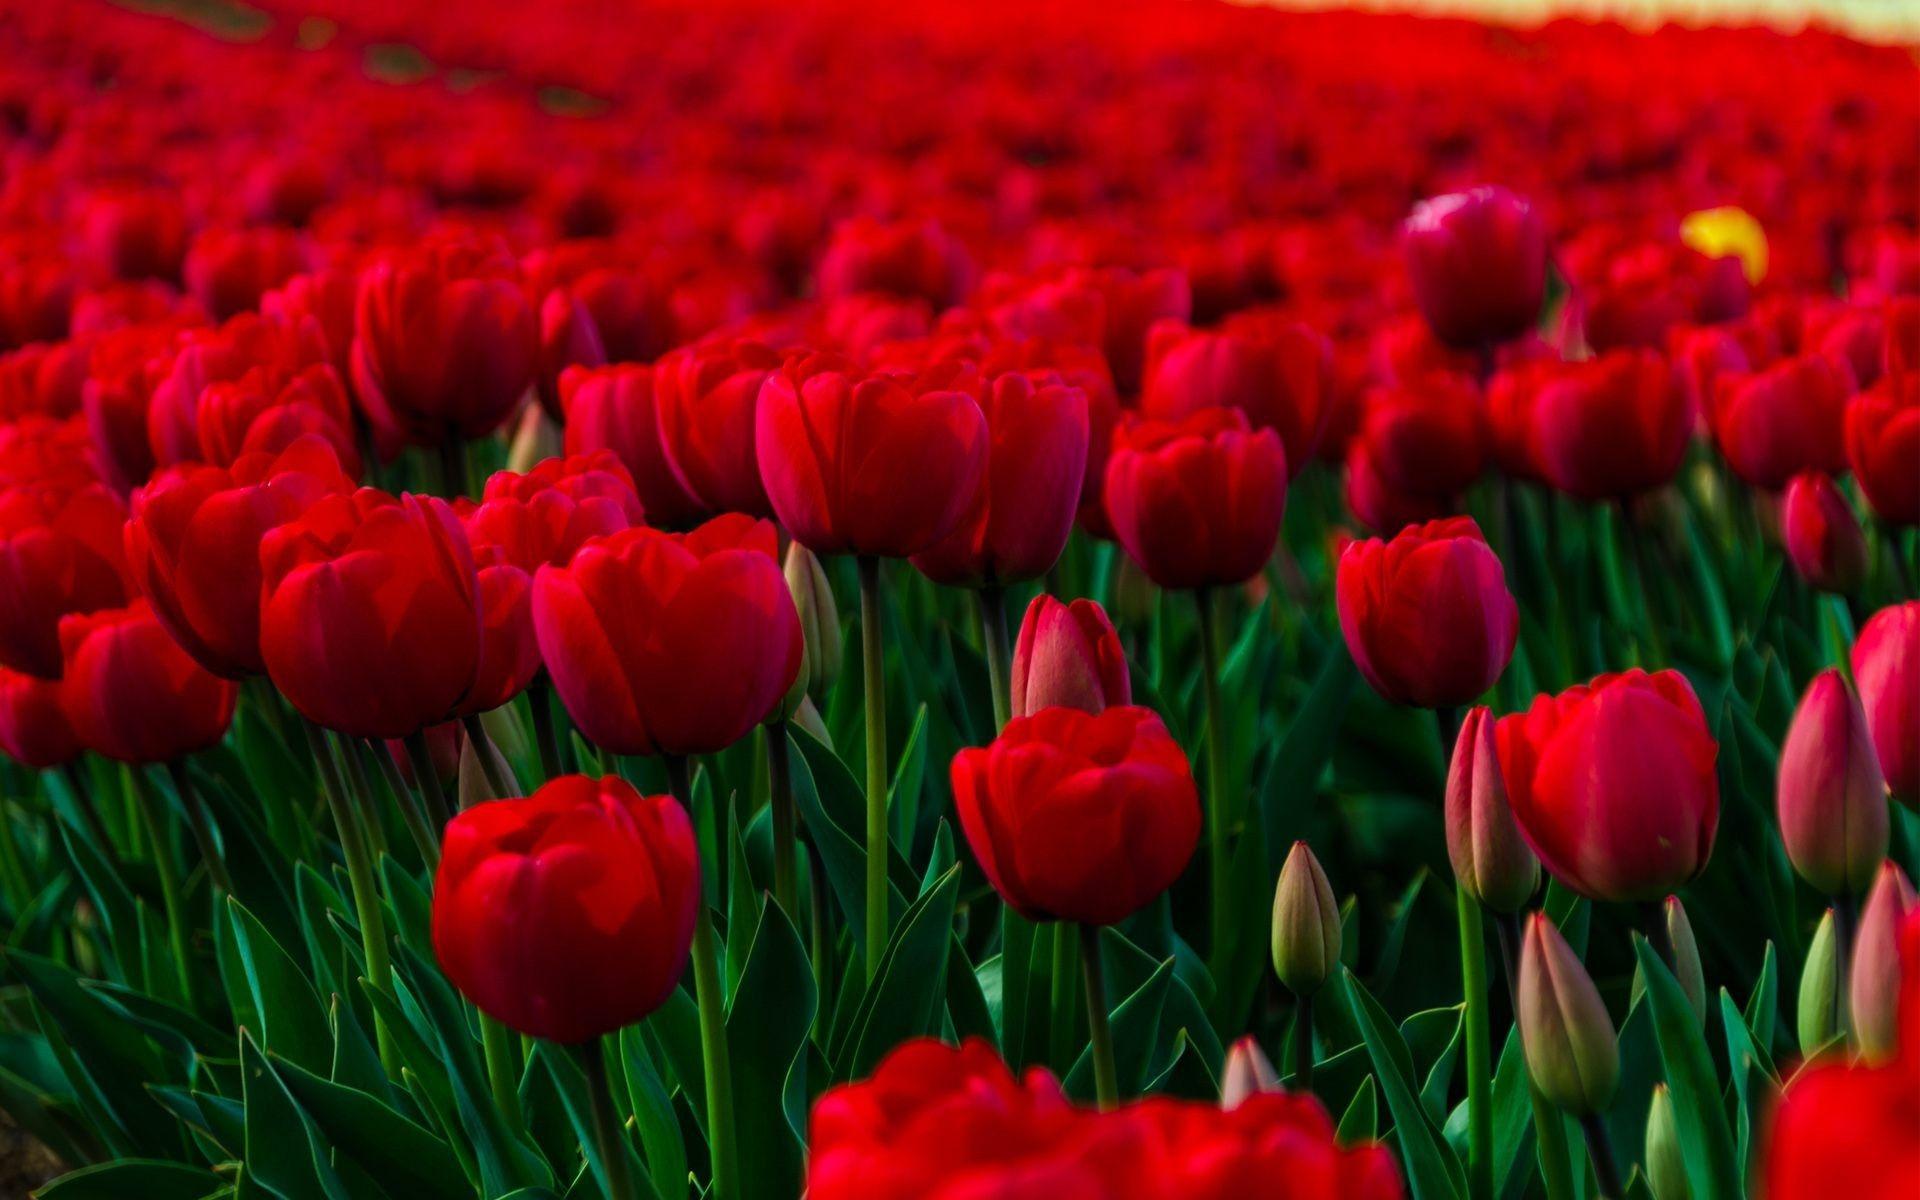 Red Flower Wallpapers Full Hd Red Flower Wallpaper Beautiful Flowers Images Flower Images Wallpapers